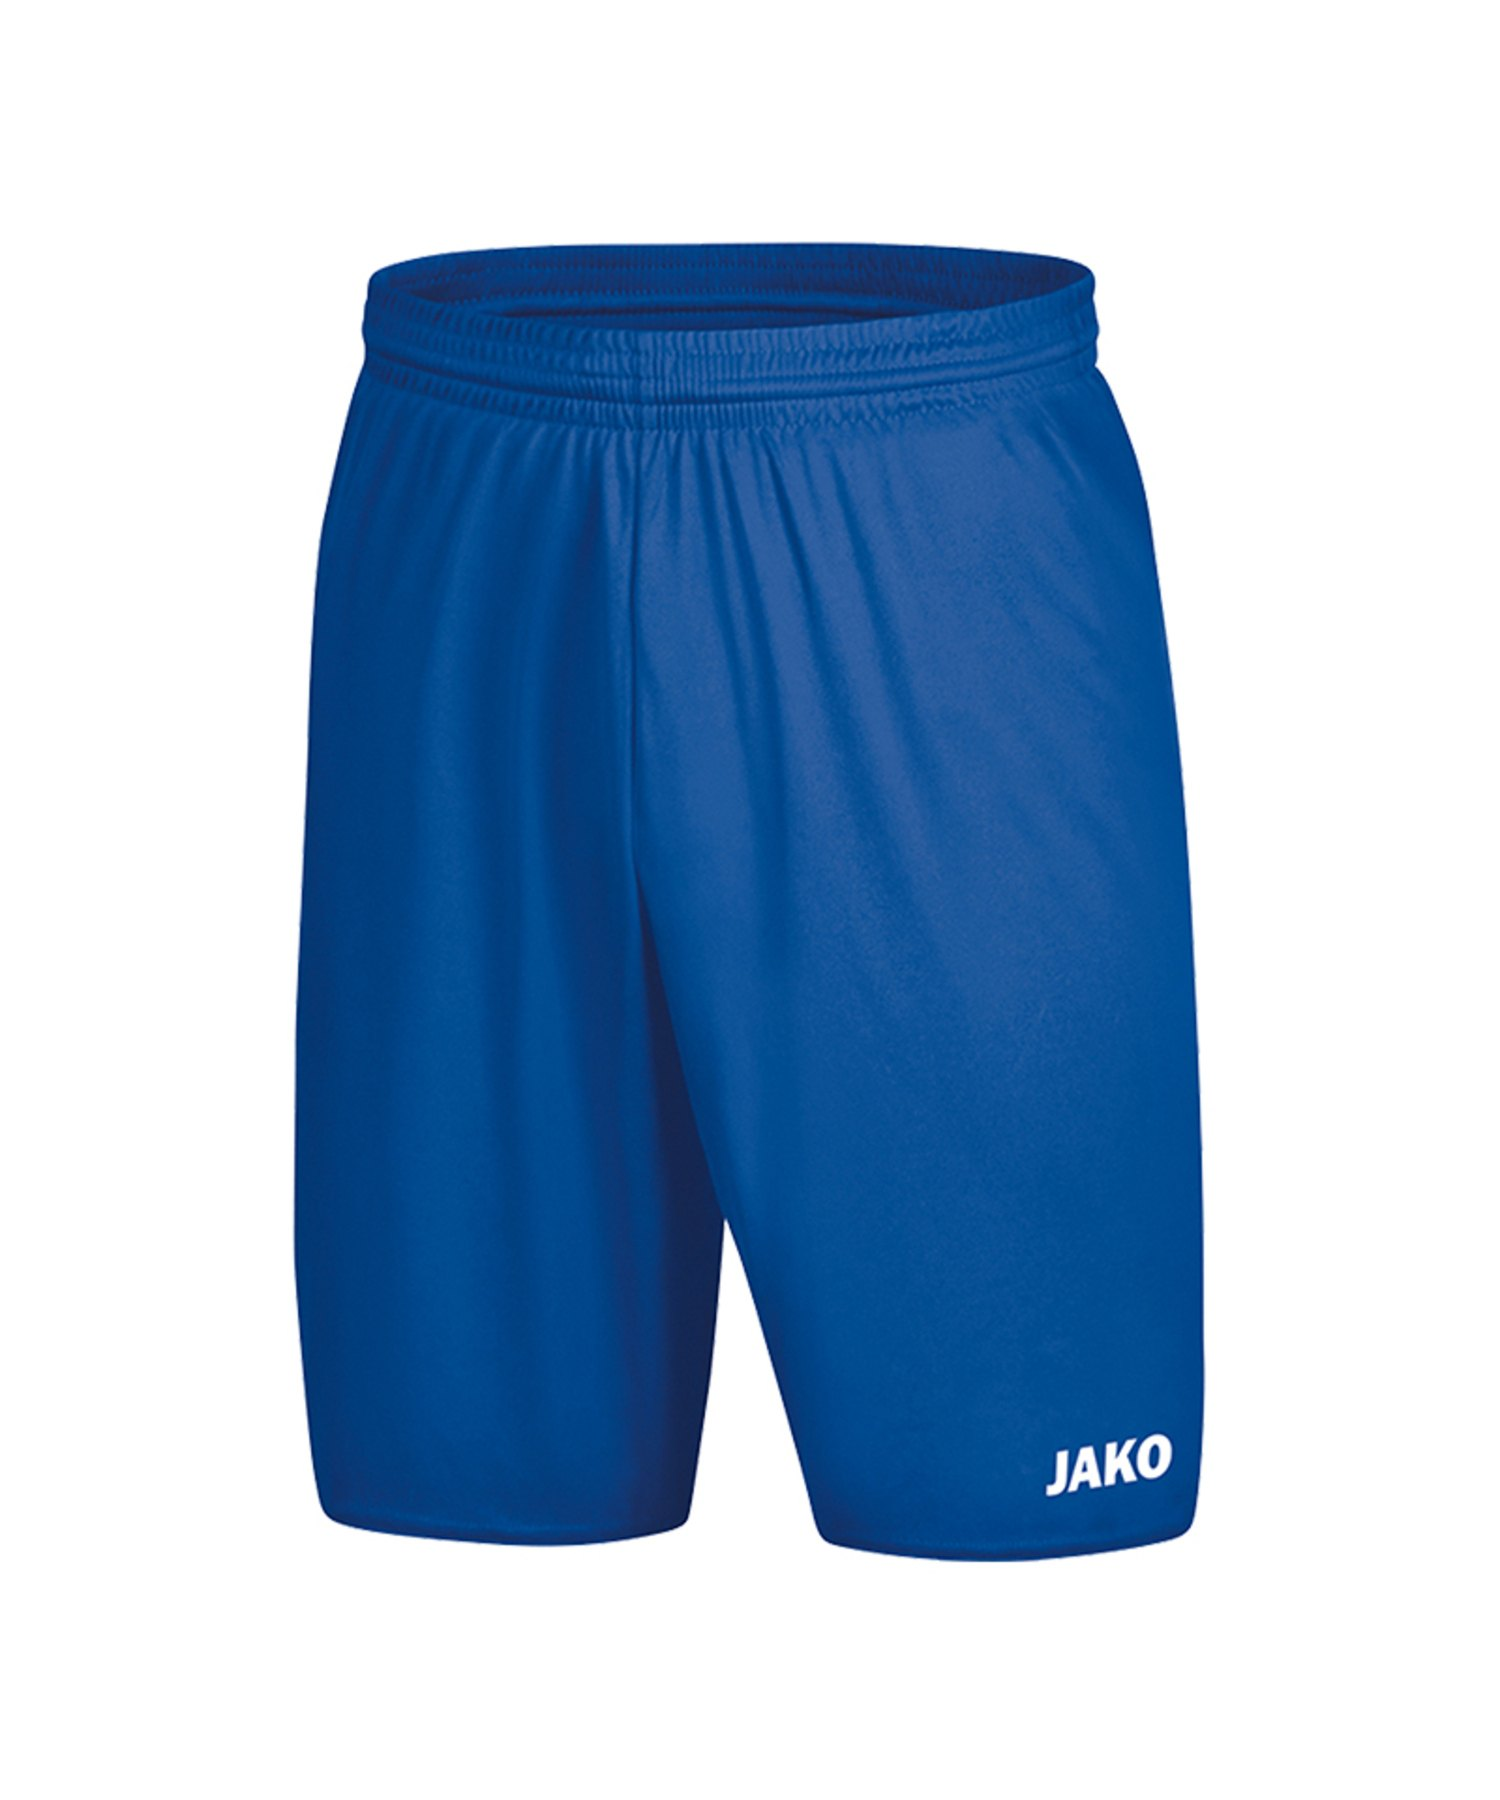 Jako Anderlecht 2.0 Short Hose kurz Kids Blau F04 - Blau